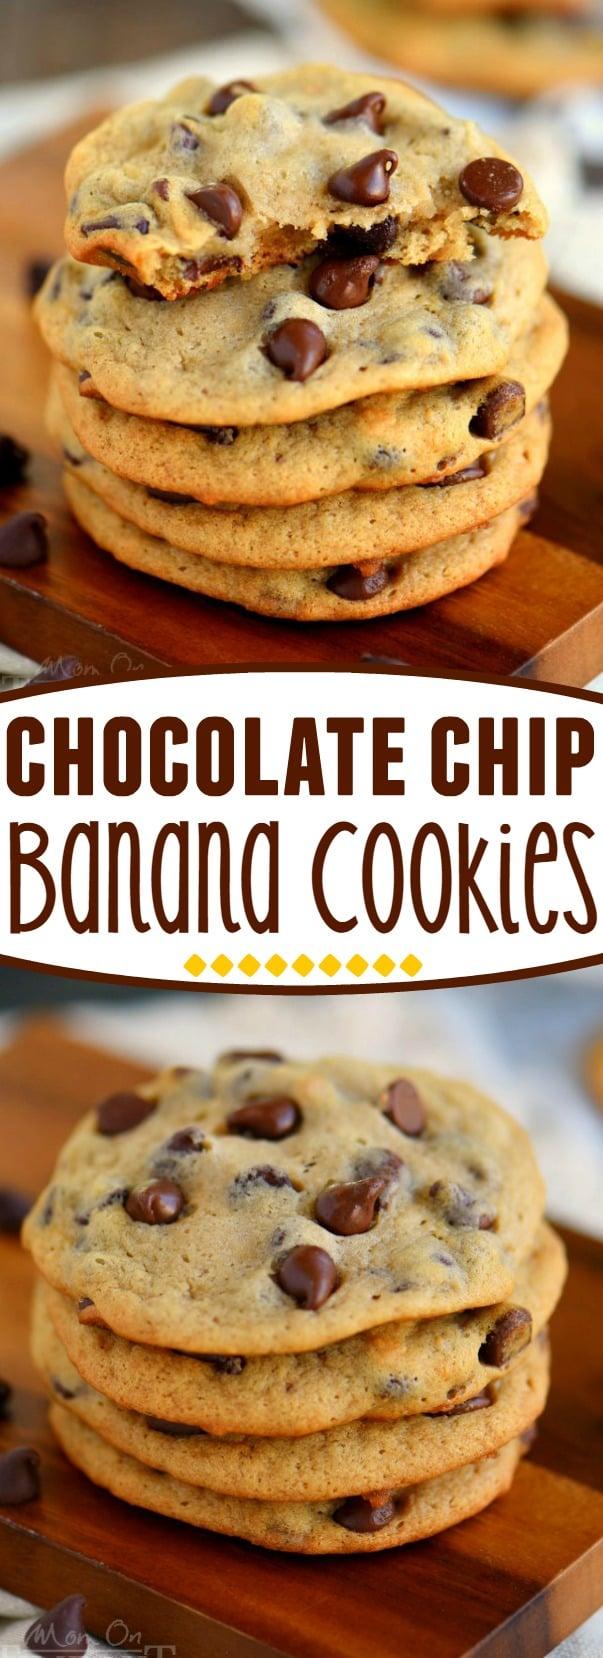 chocolate-chip-banana-cookies